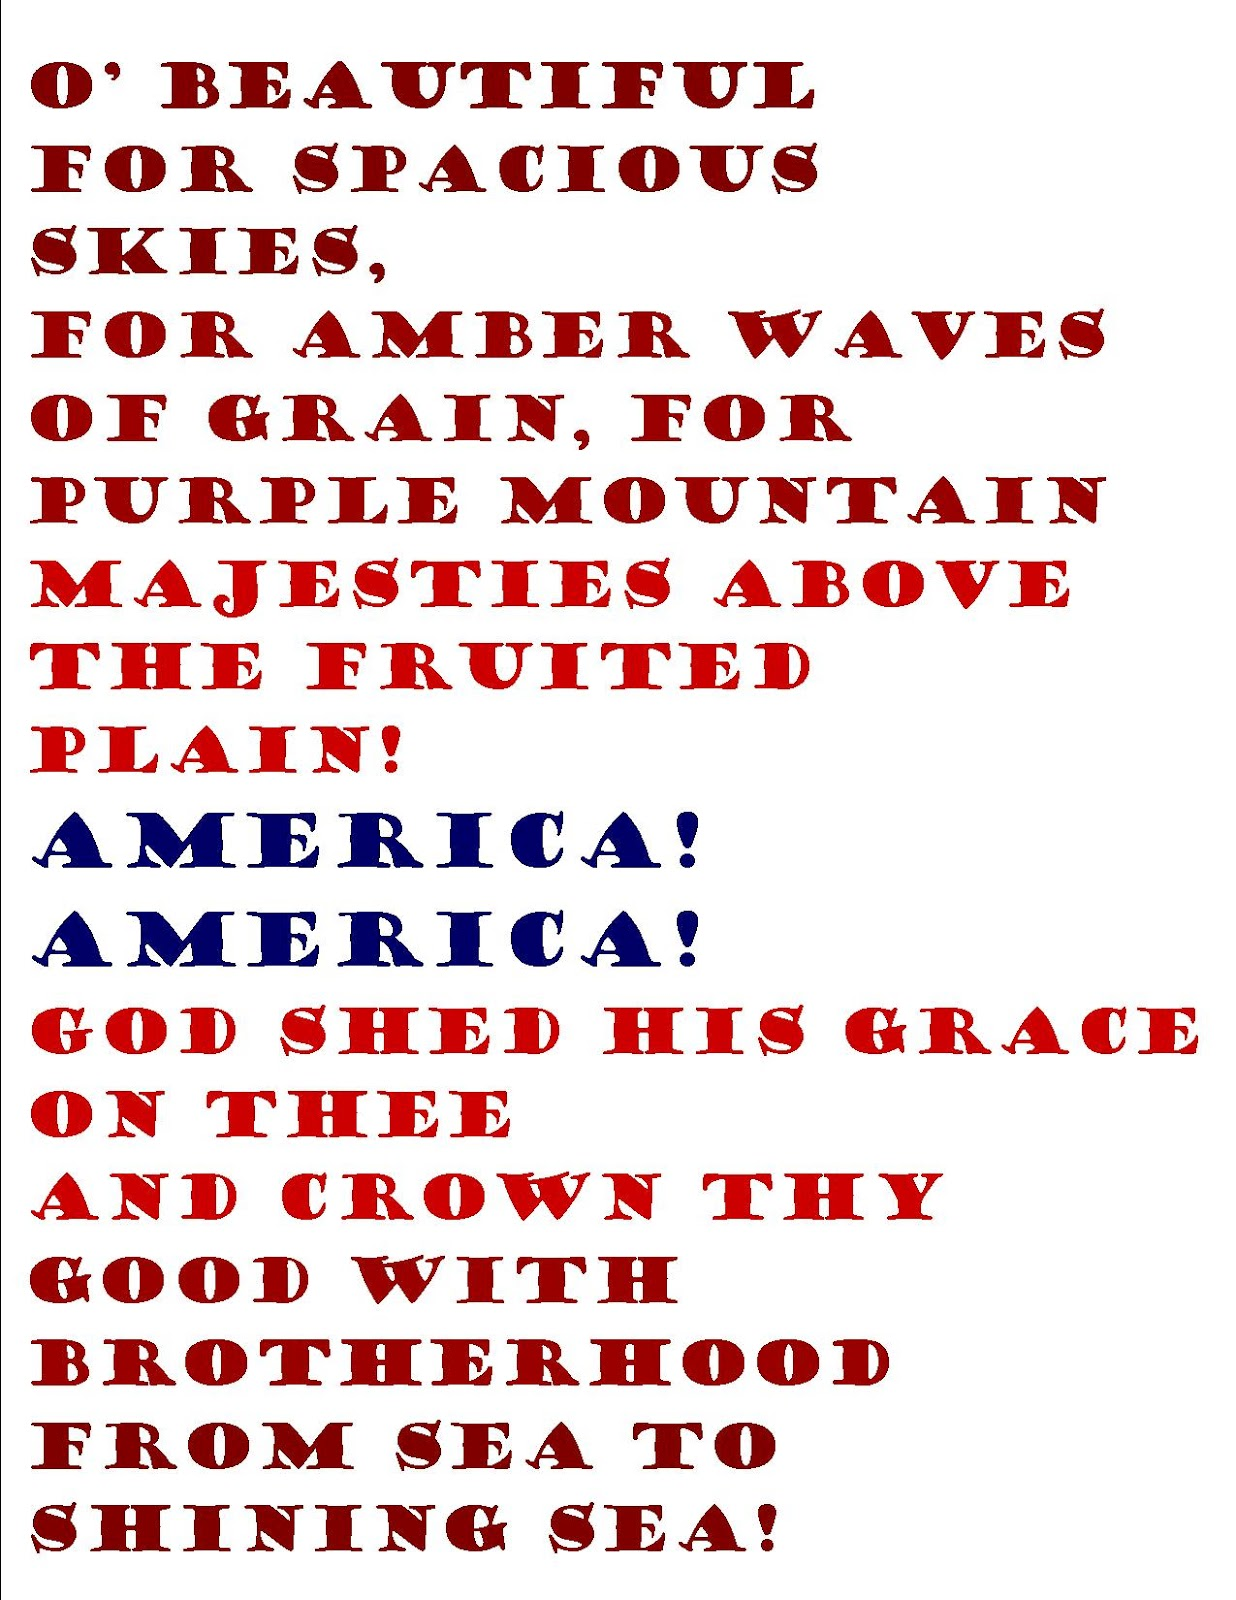 America the Beautiful - Genius | Song Lyrics & Knowledge